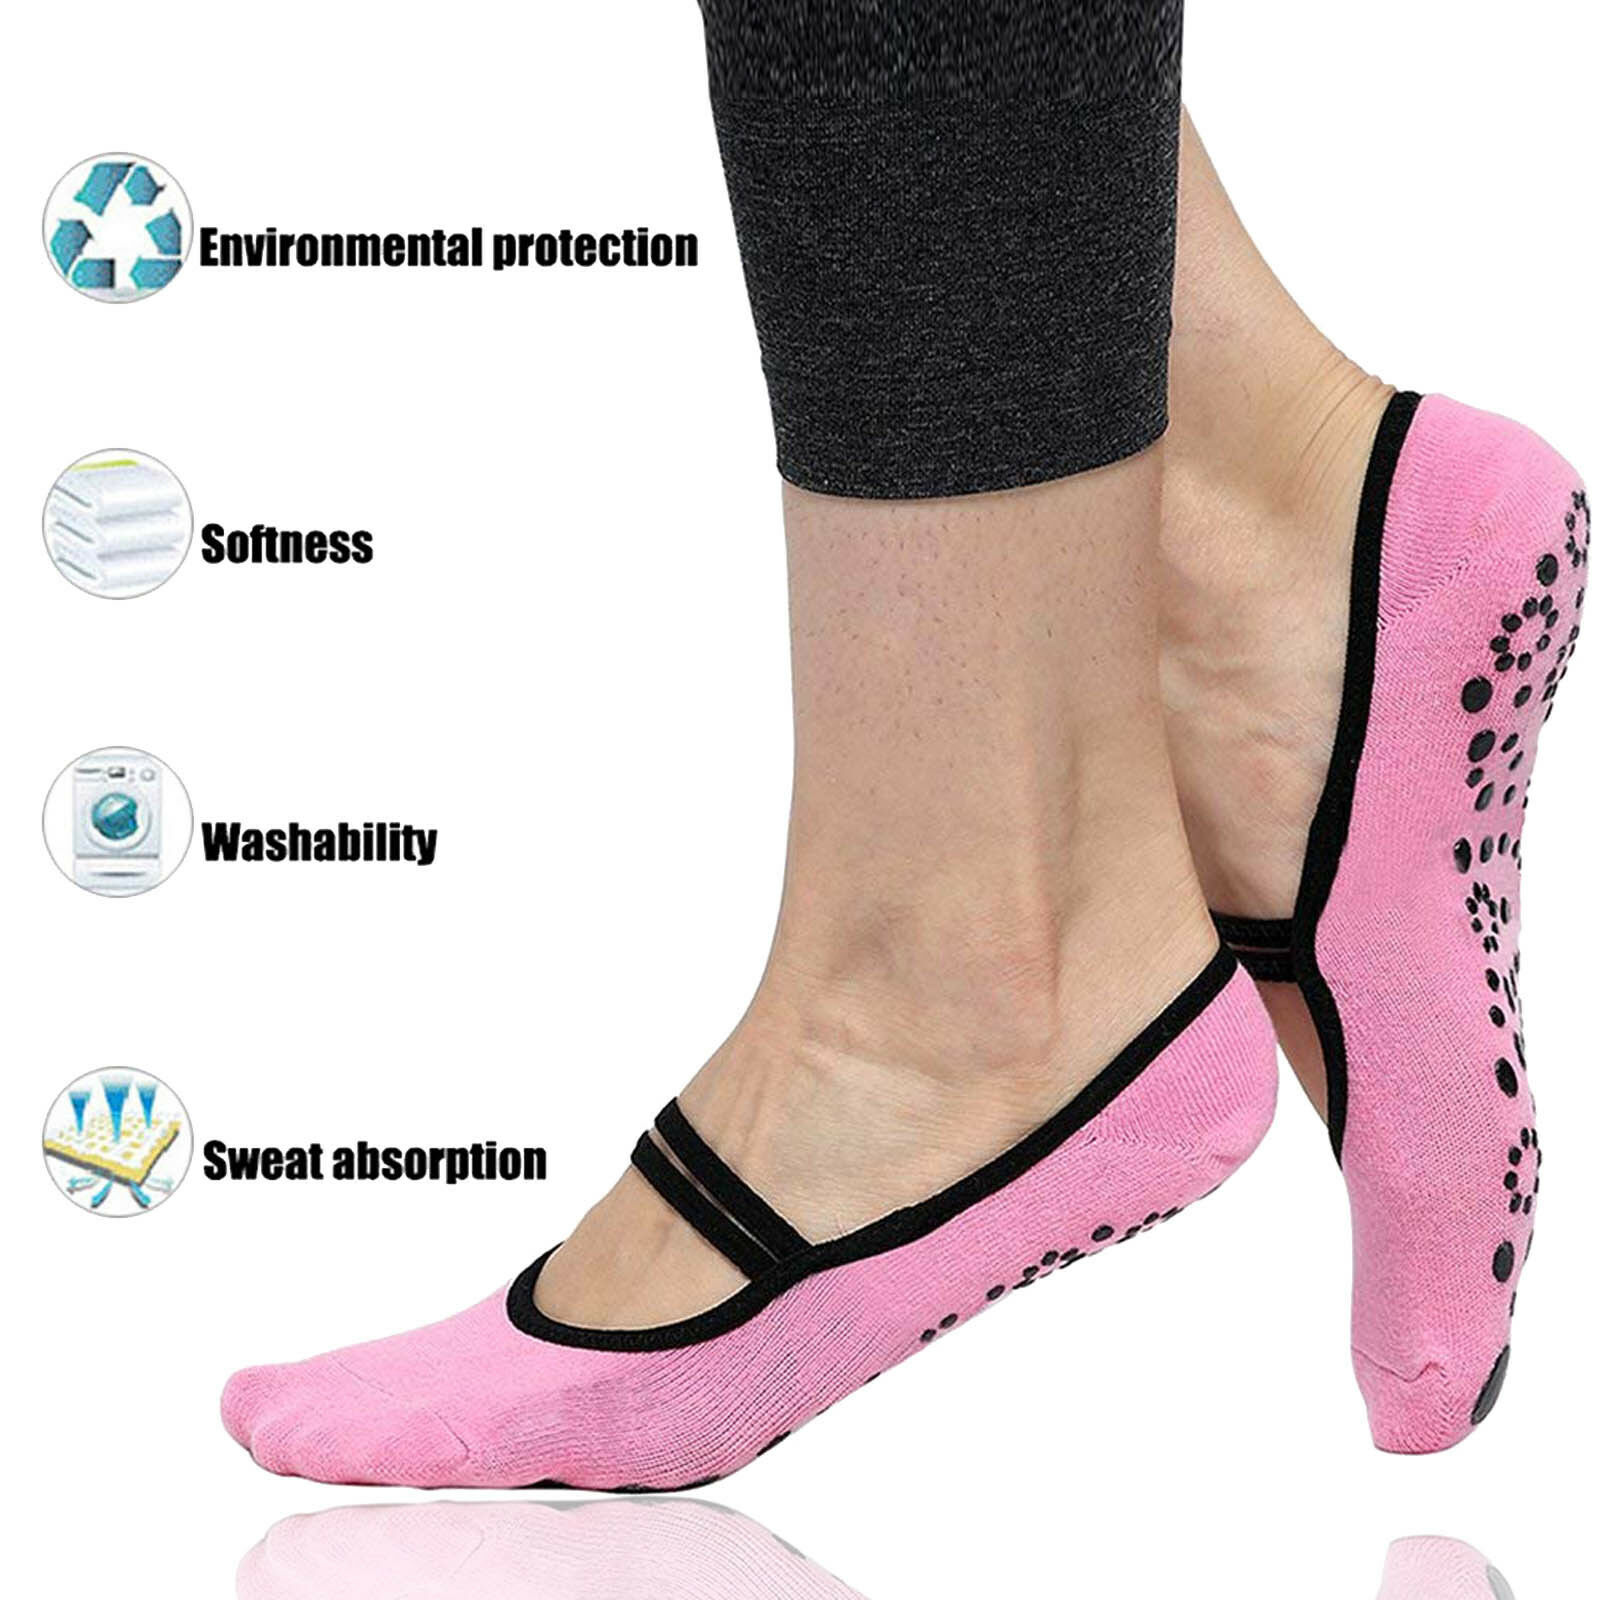 Soft Yoga Socks for Women Non Skid Socks with Grips Barre So